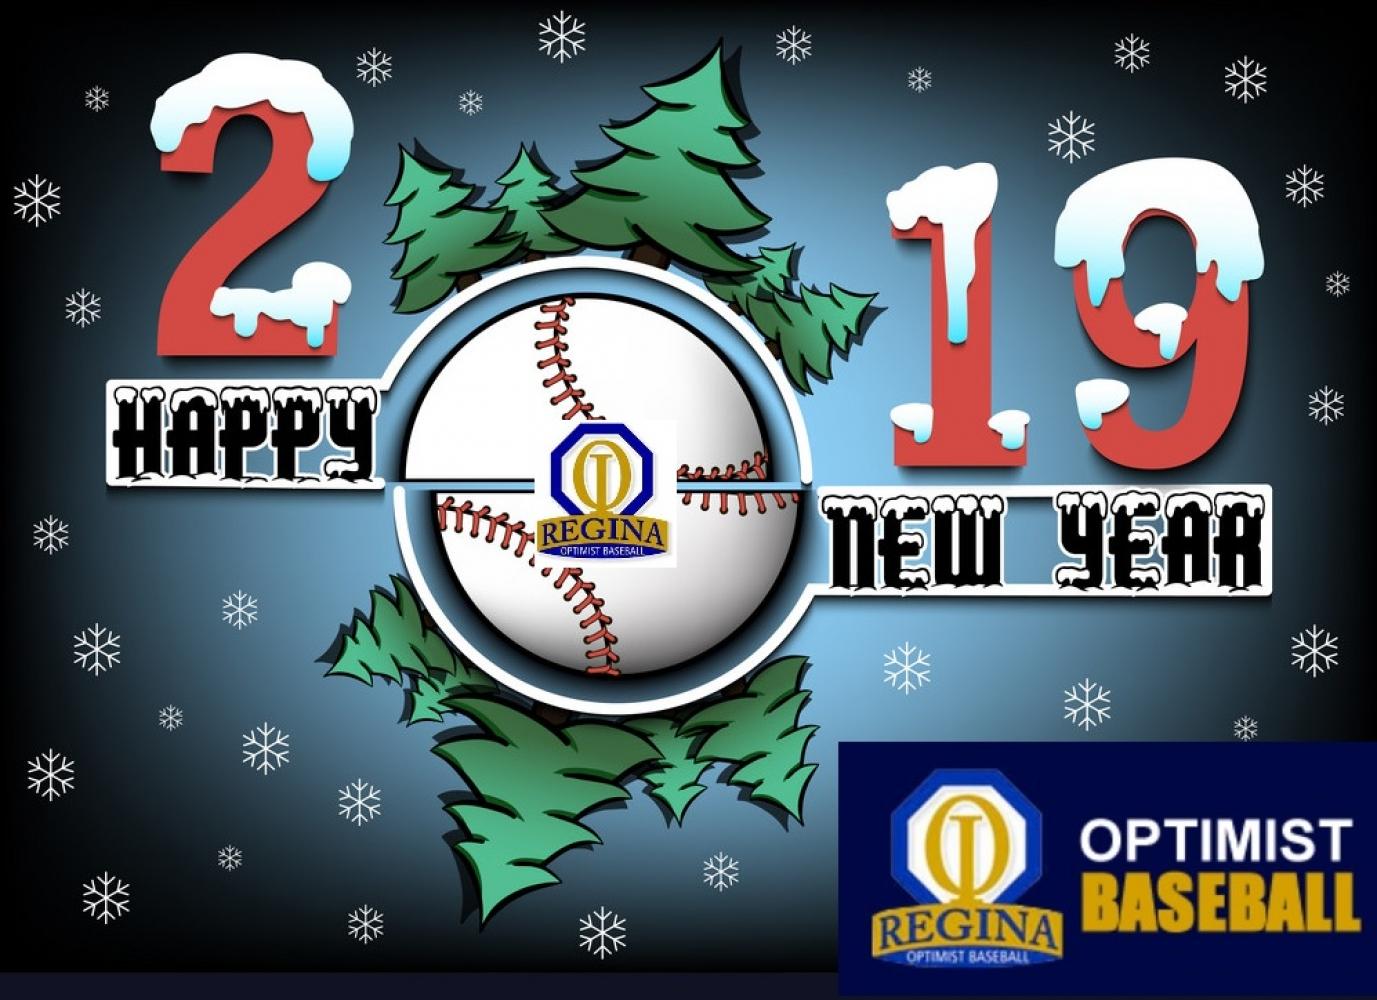 Happy New Year from Regina Optimist Baseball Association & Park !!!